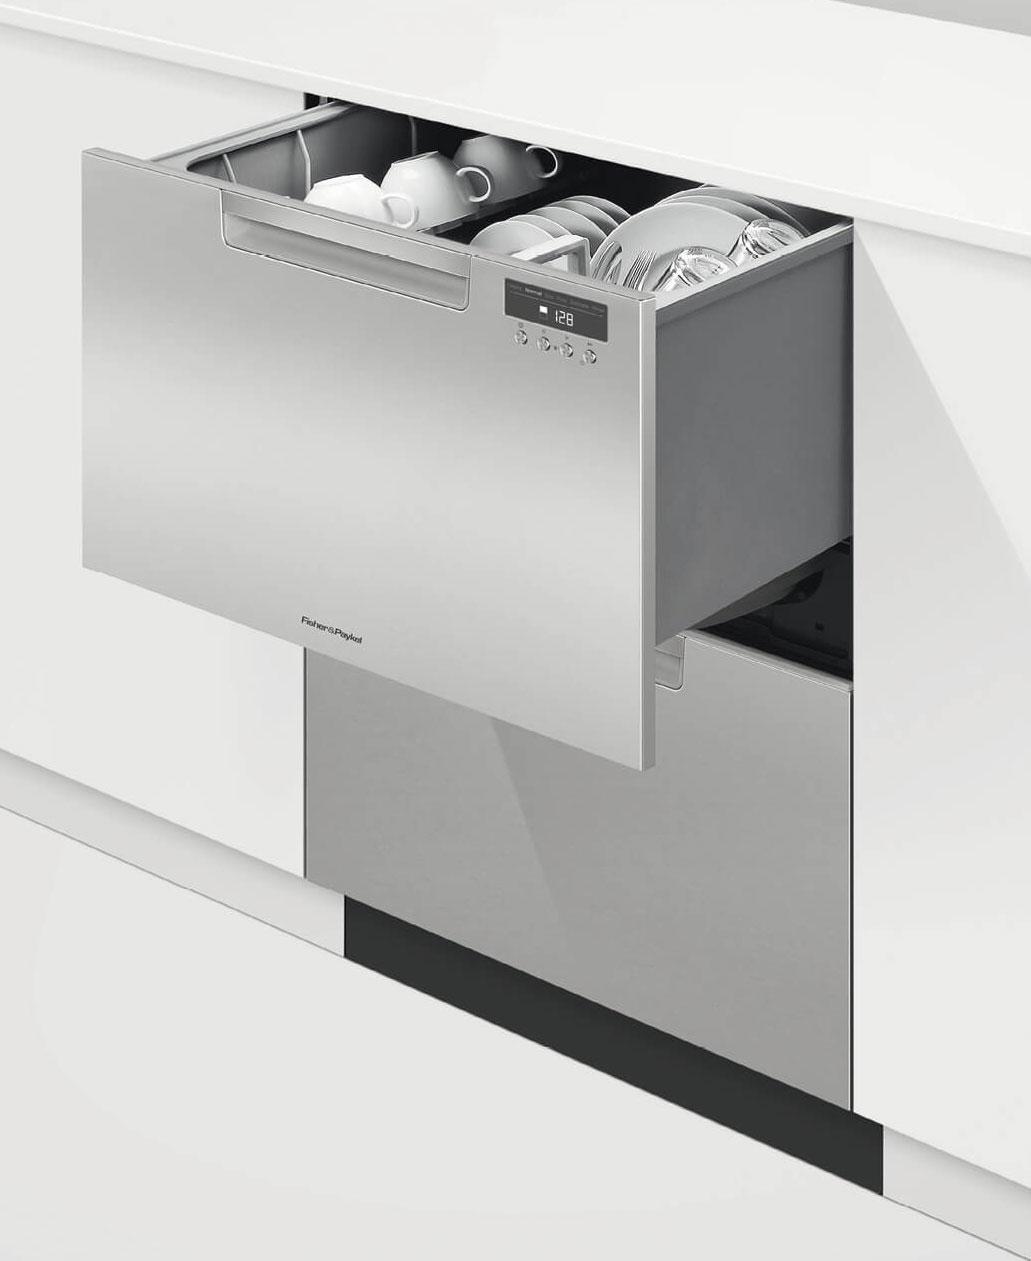 Fisher and paykel 2 drawer dishwasher - Larger Image 1 2 3